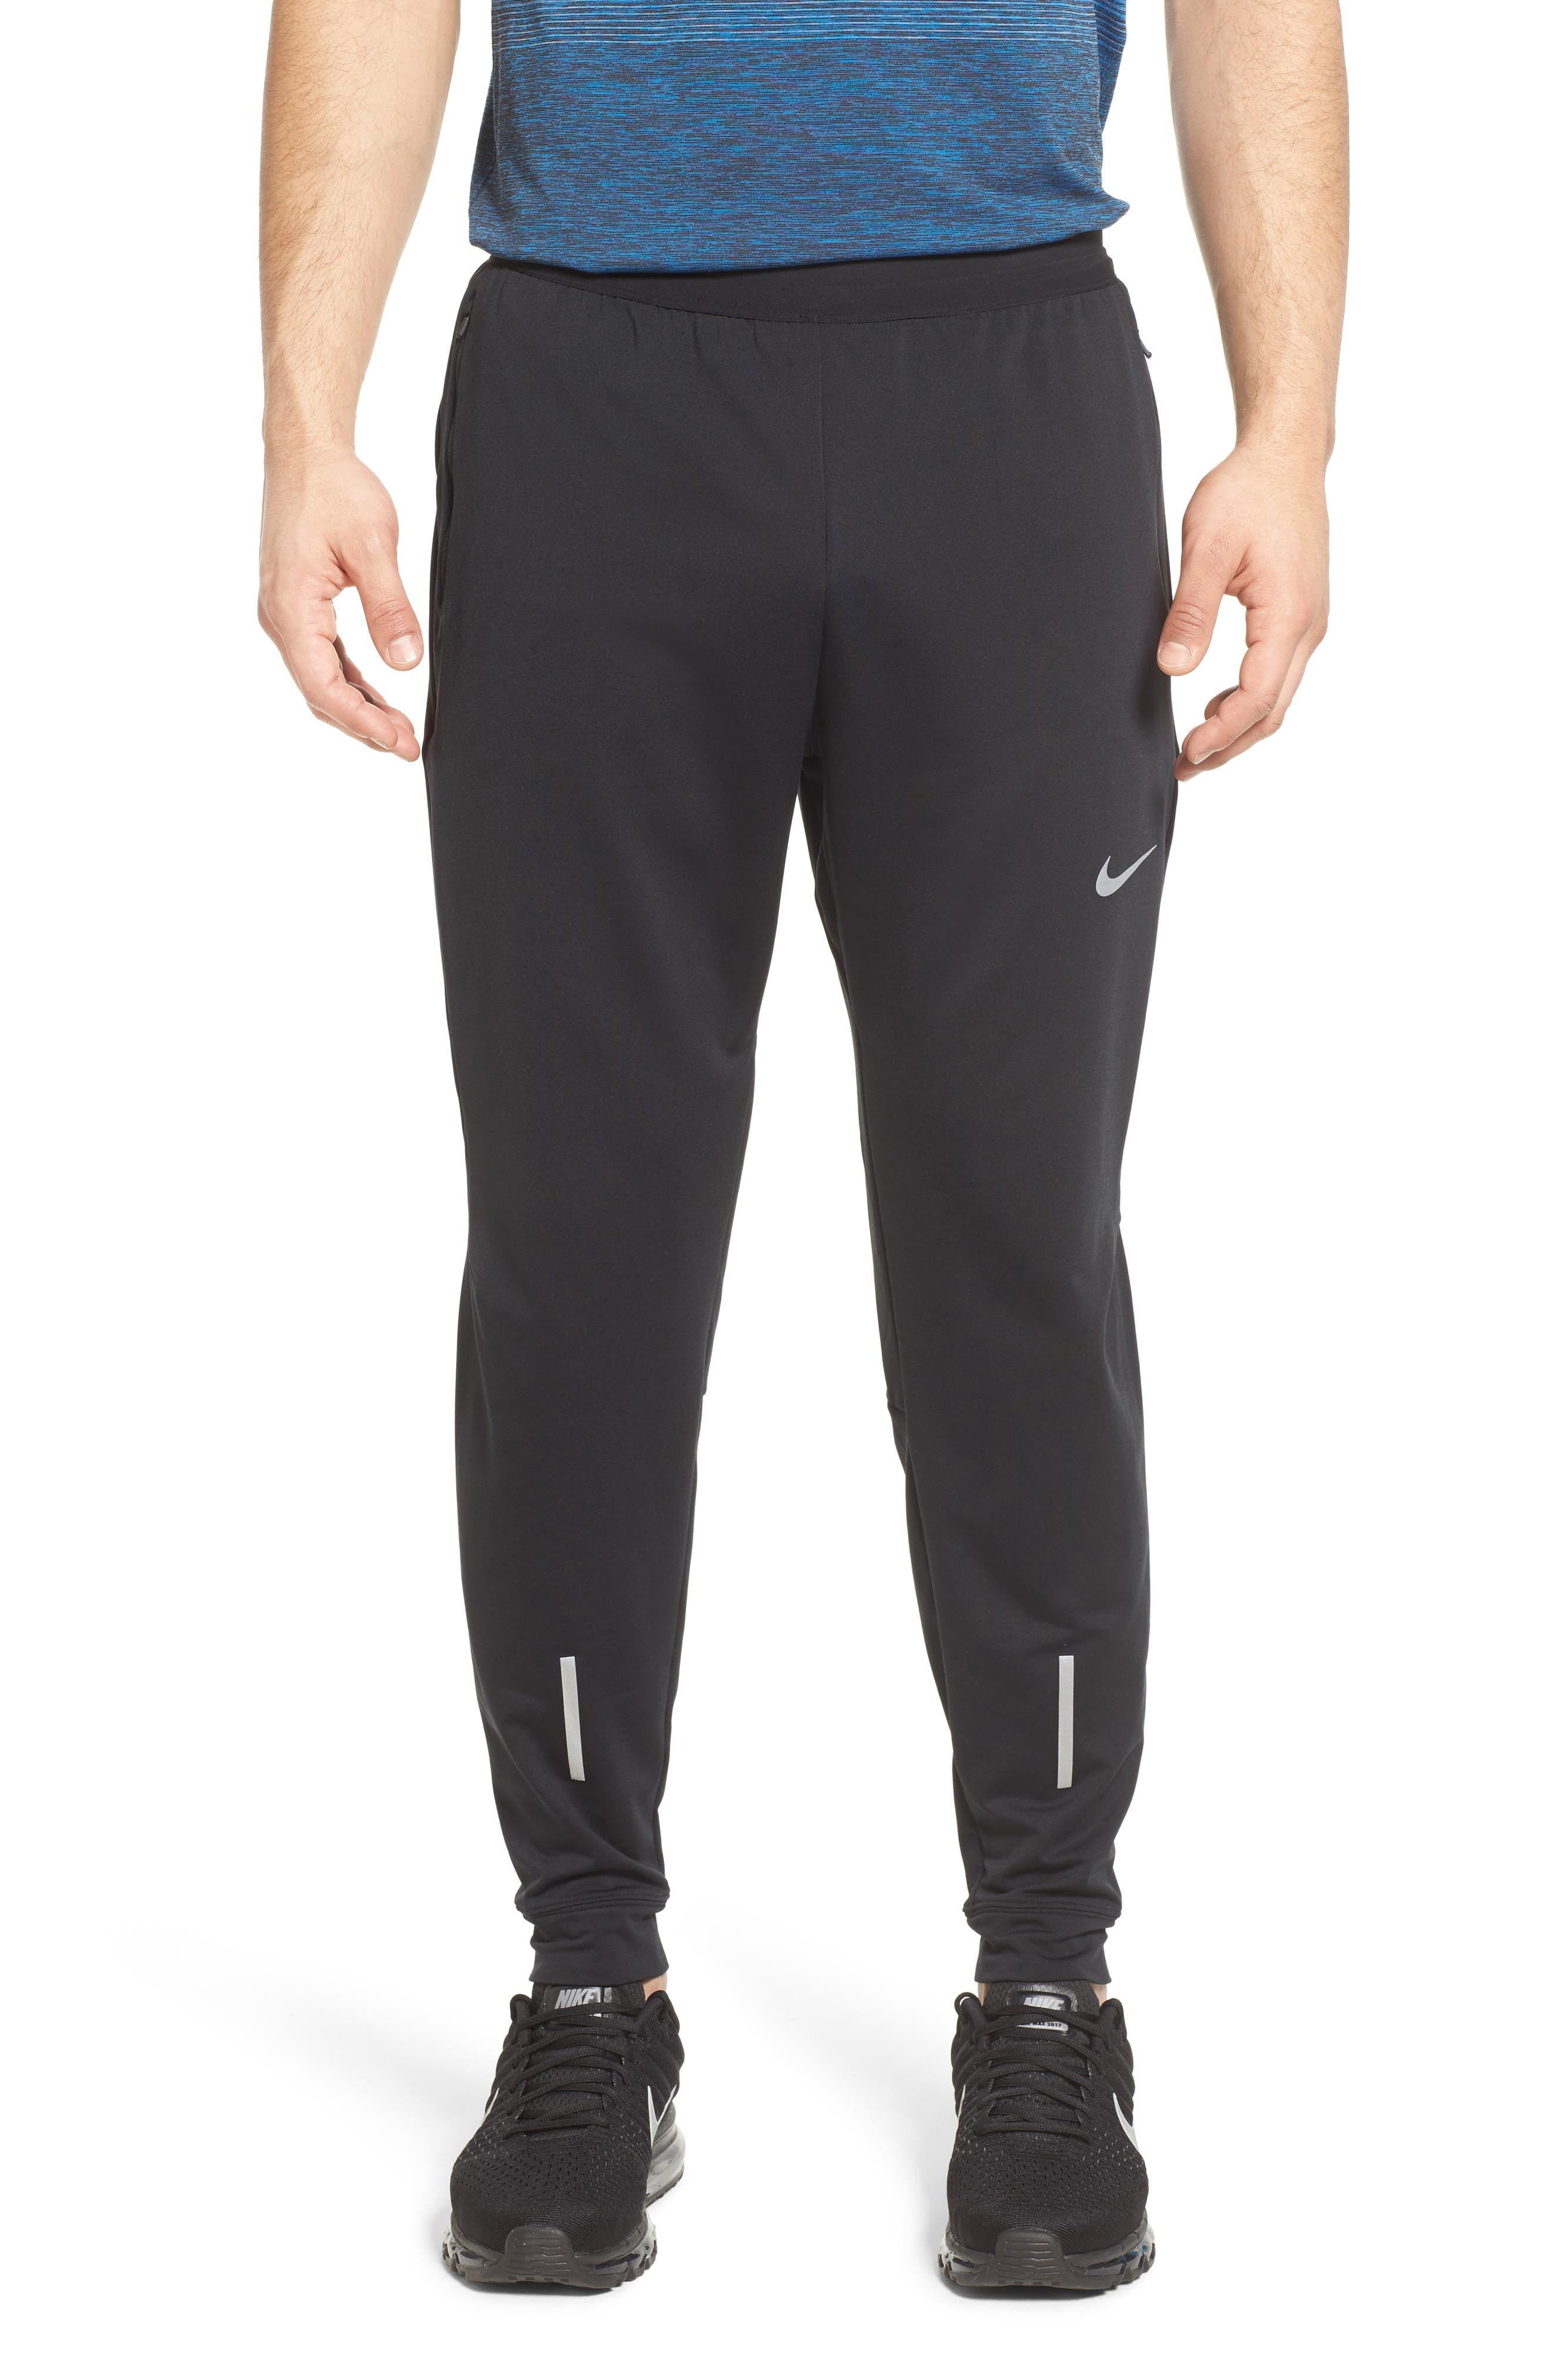 Nike Dry Running Pants